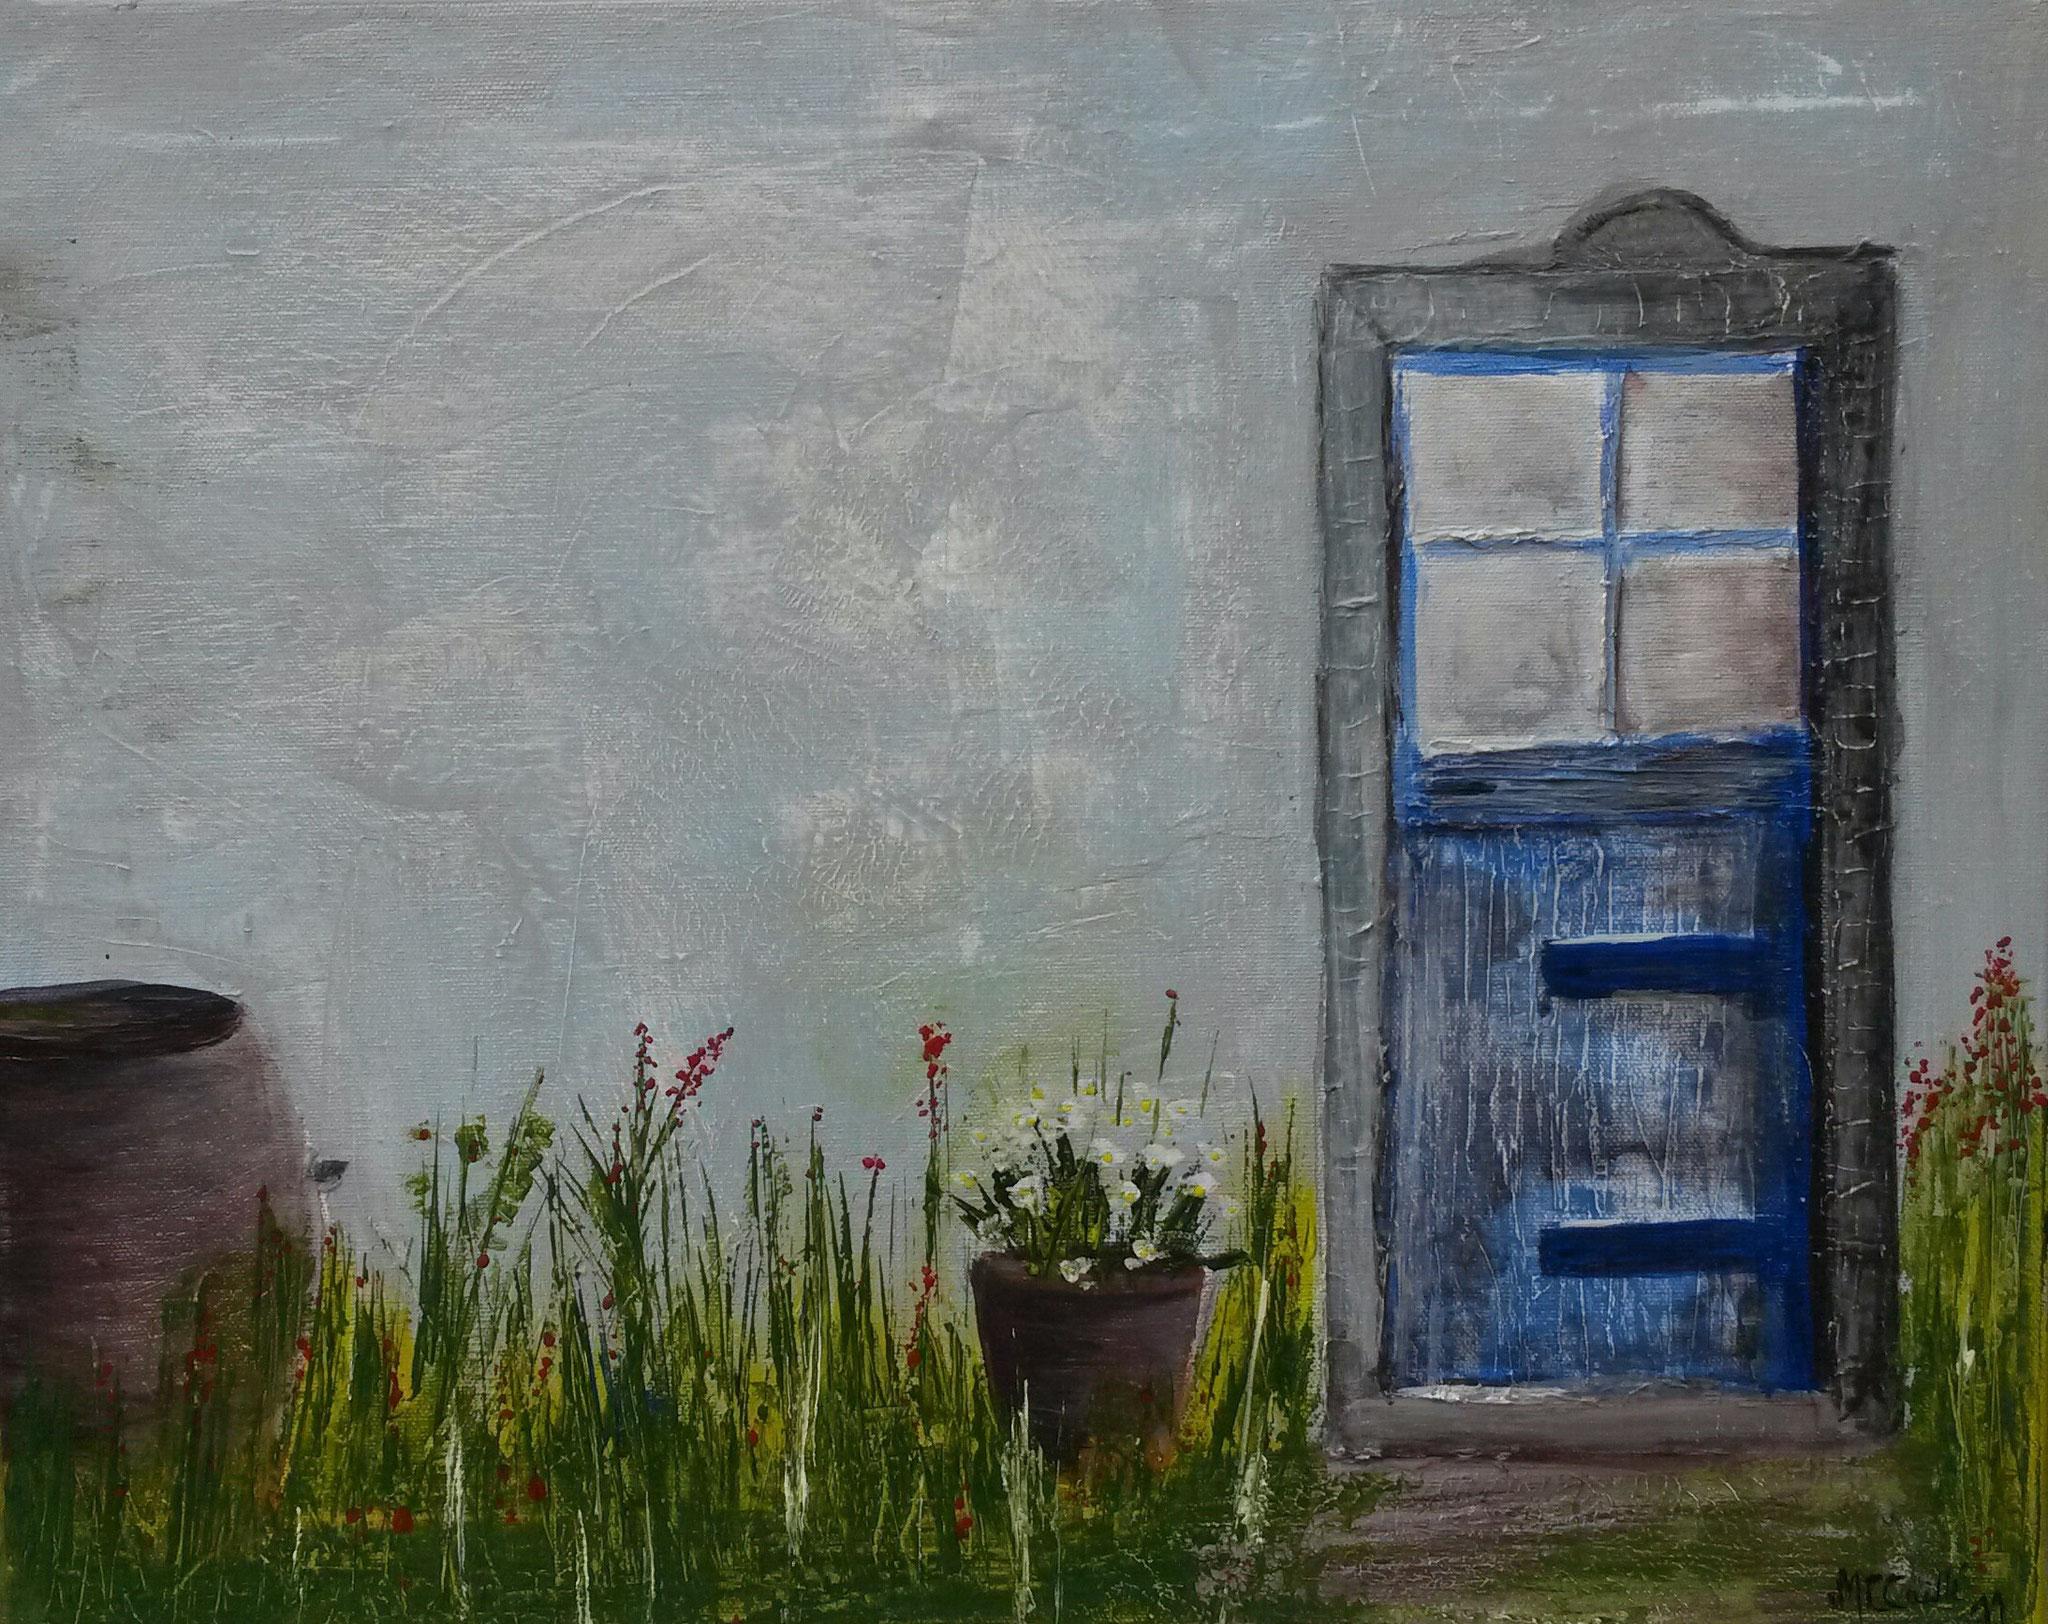 """Campagne"" - Acryl auf Leinwand  / ""Campagne - Acrylique sur toile  40 x 50 cm"